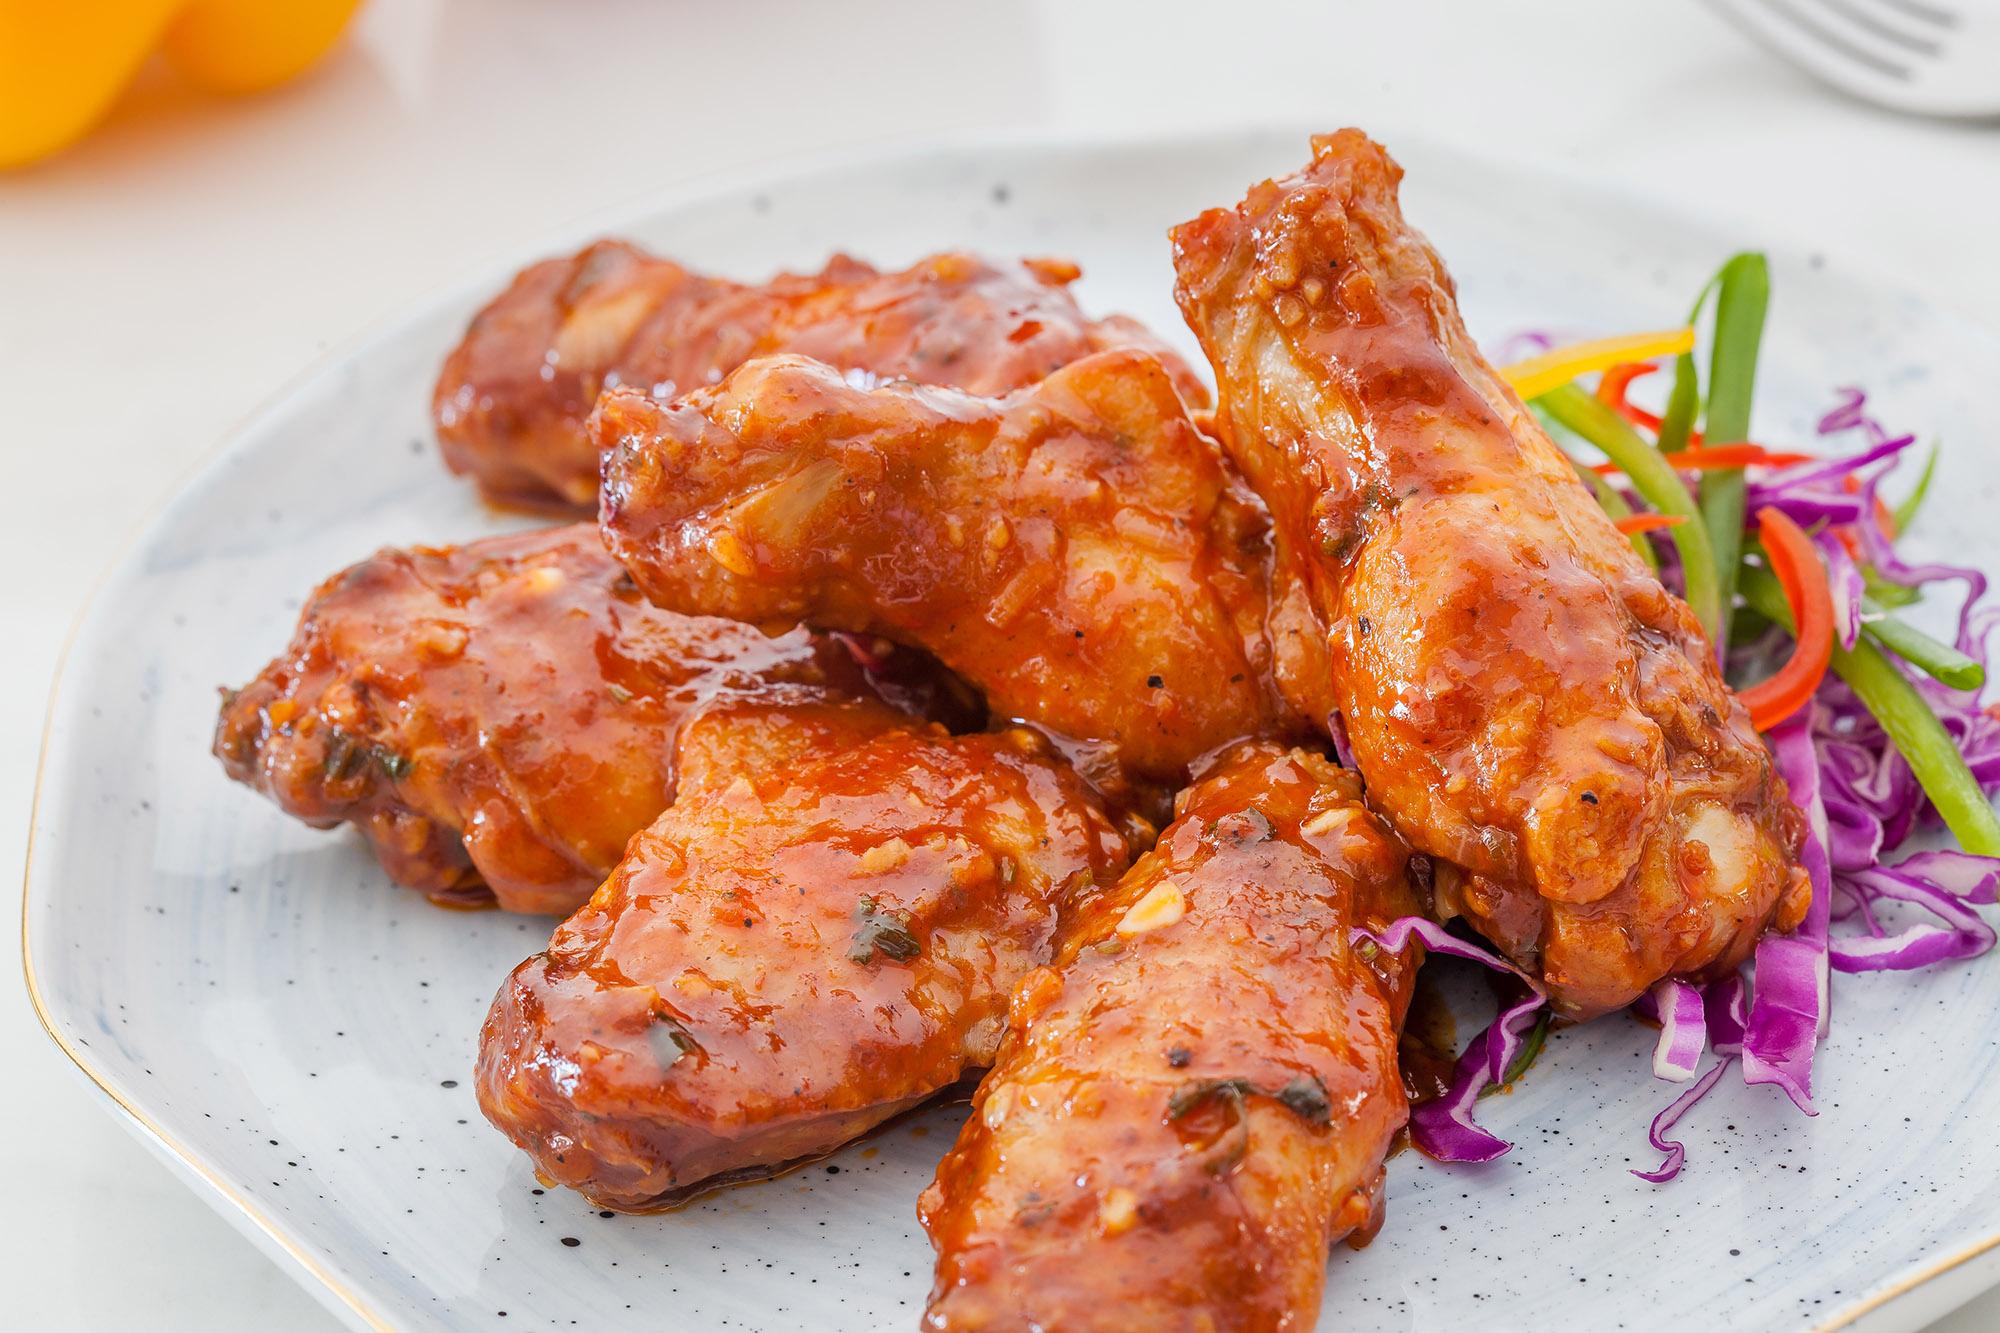 Centurion Chicken Wings